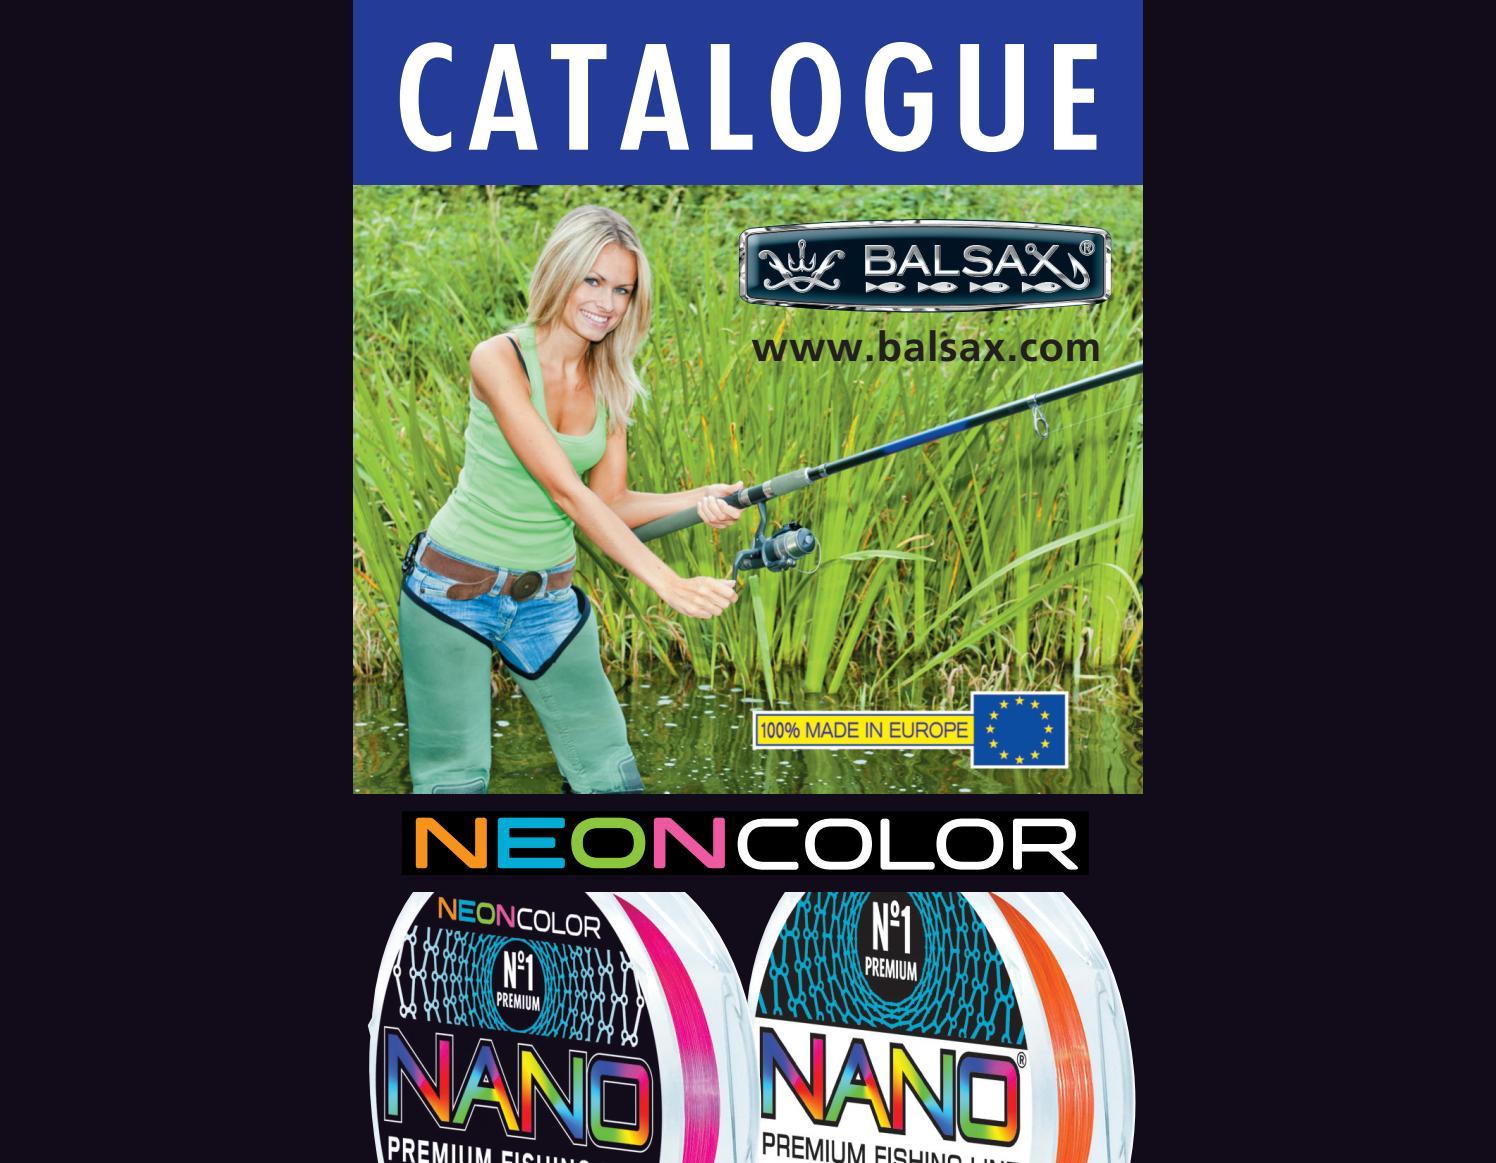 Quality Fluorocarbon Fishing Line 0,20mm 100m 5,90kg Monofilament Line 0,20mm